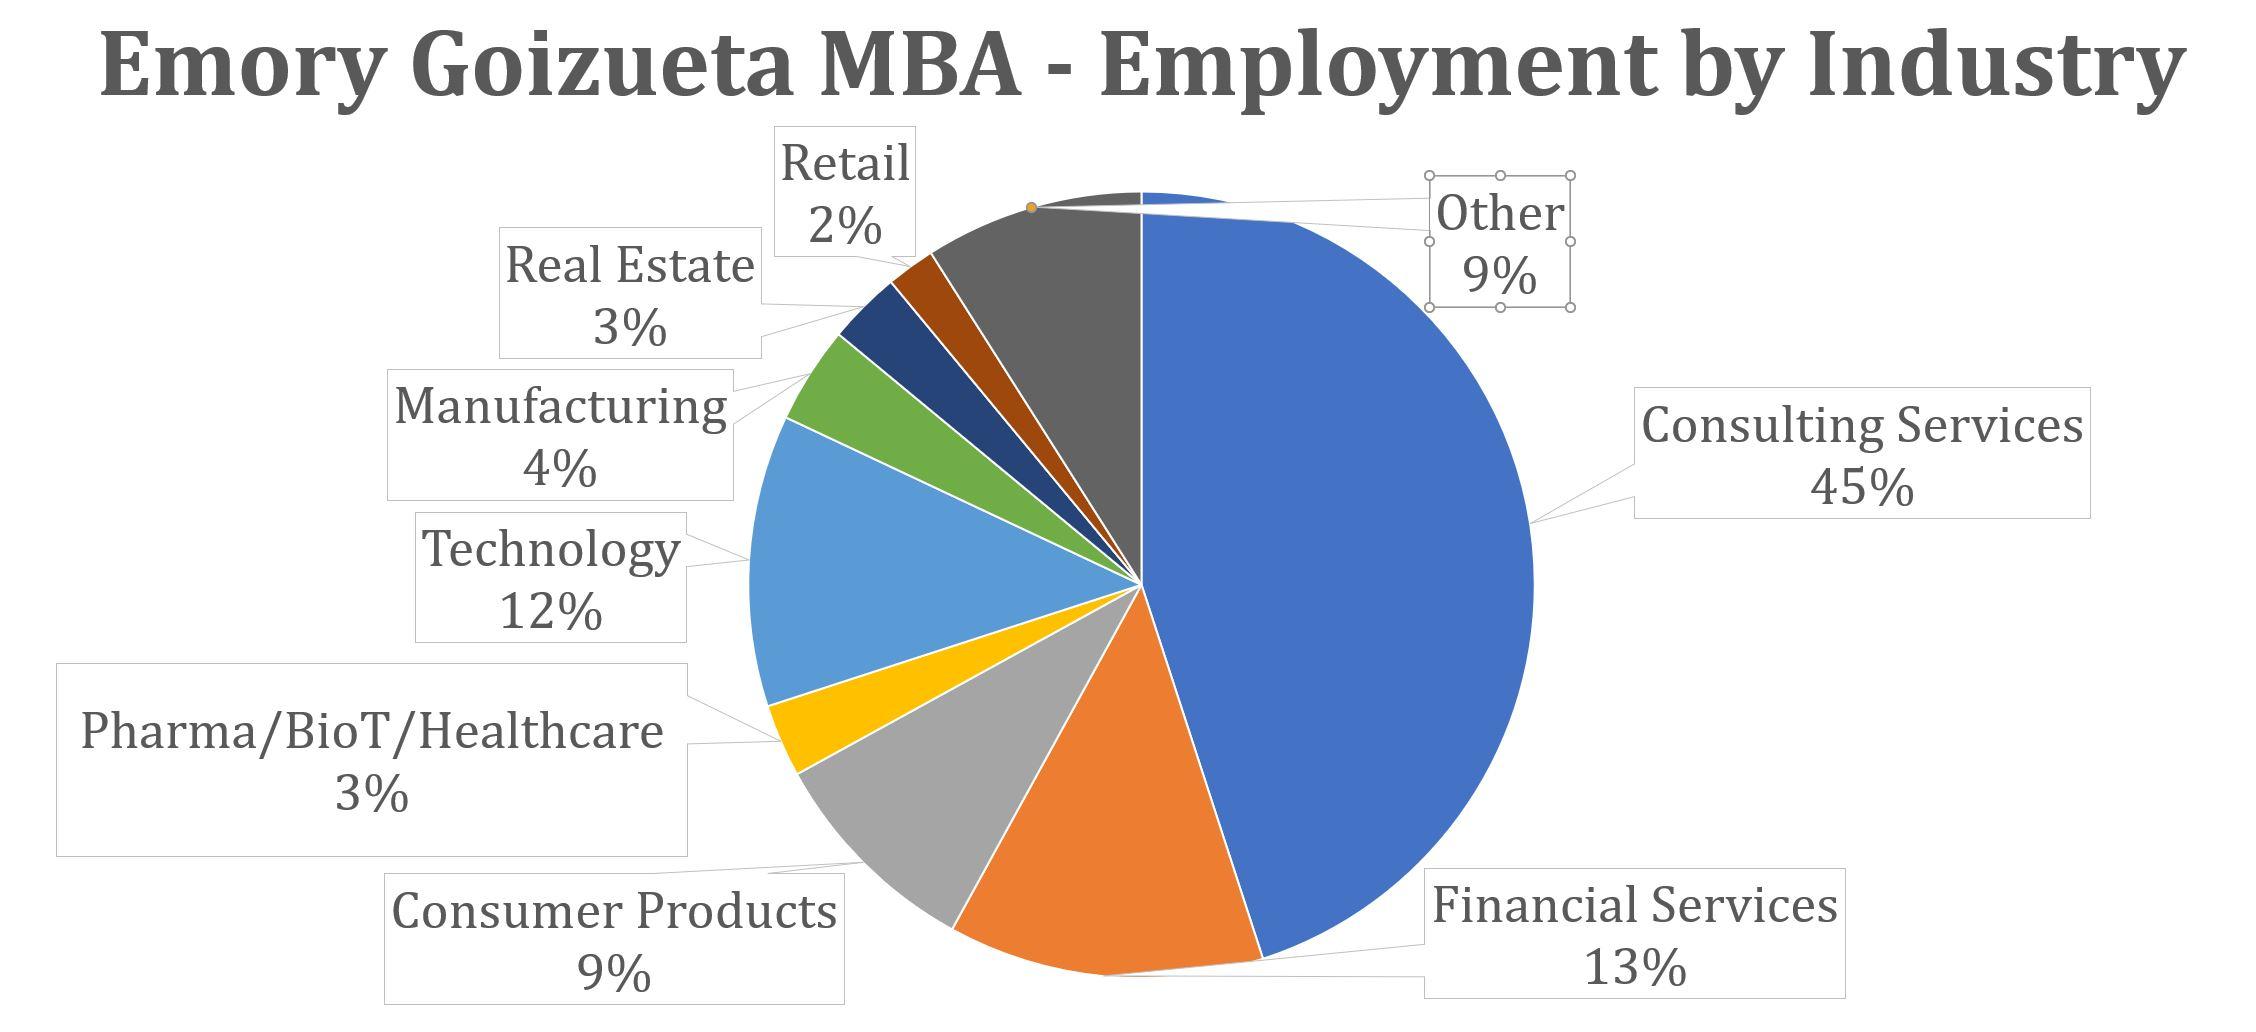 Emory Goizueta MBA - Employment by Industry